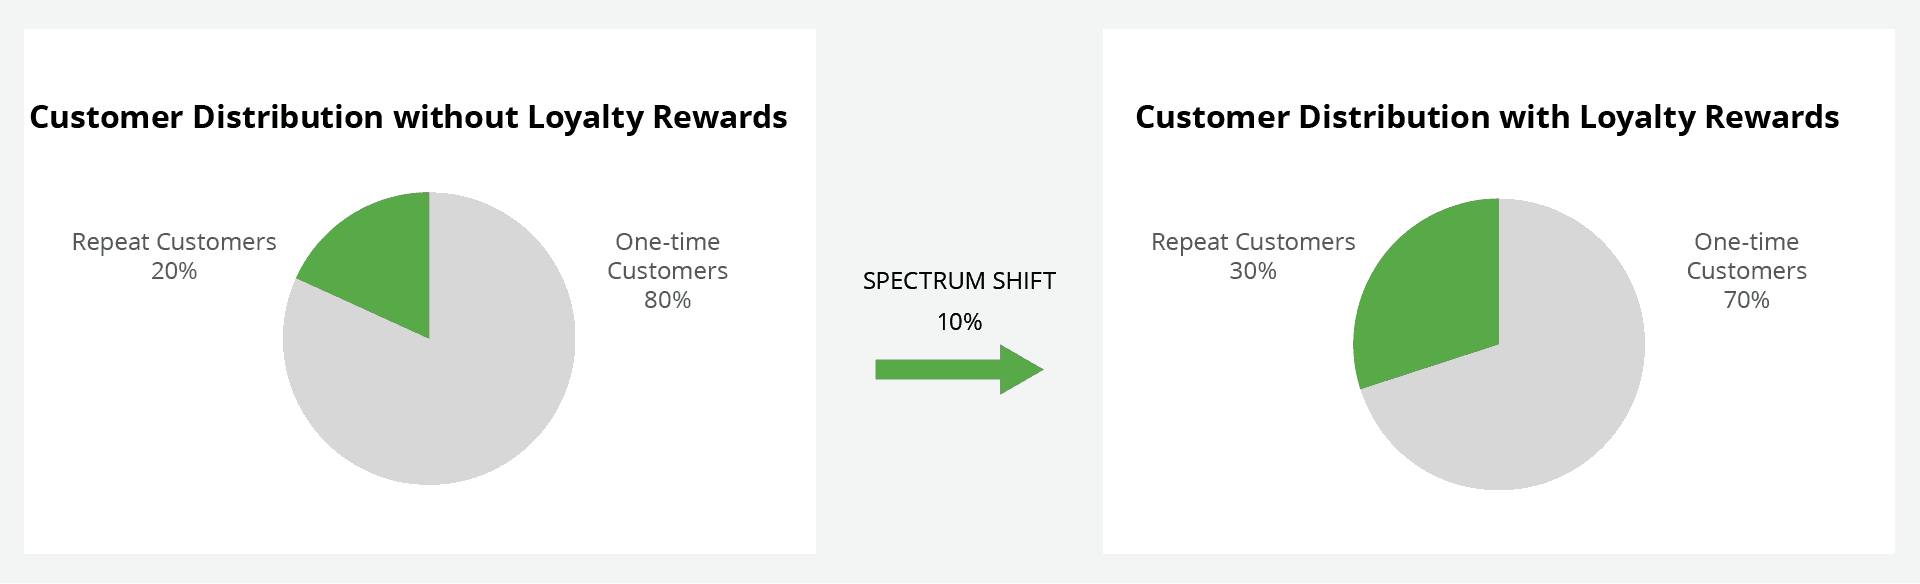 Loyalty rewards spectrum shift